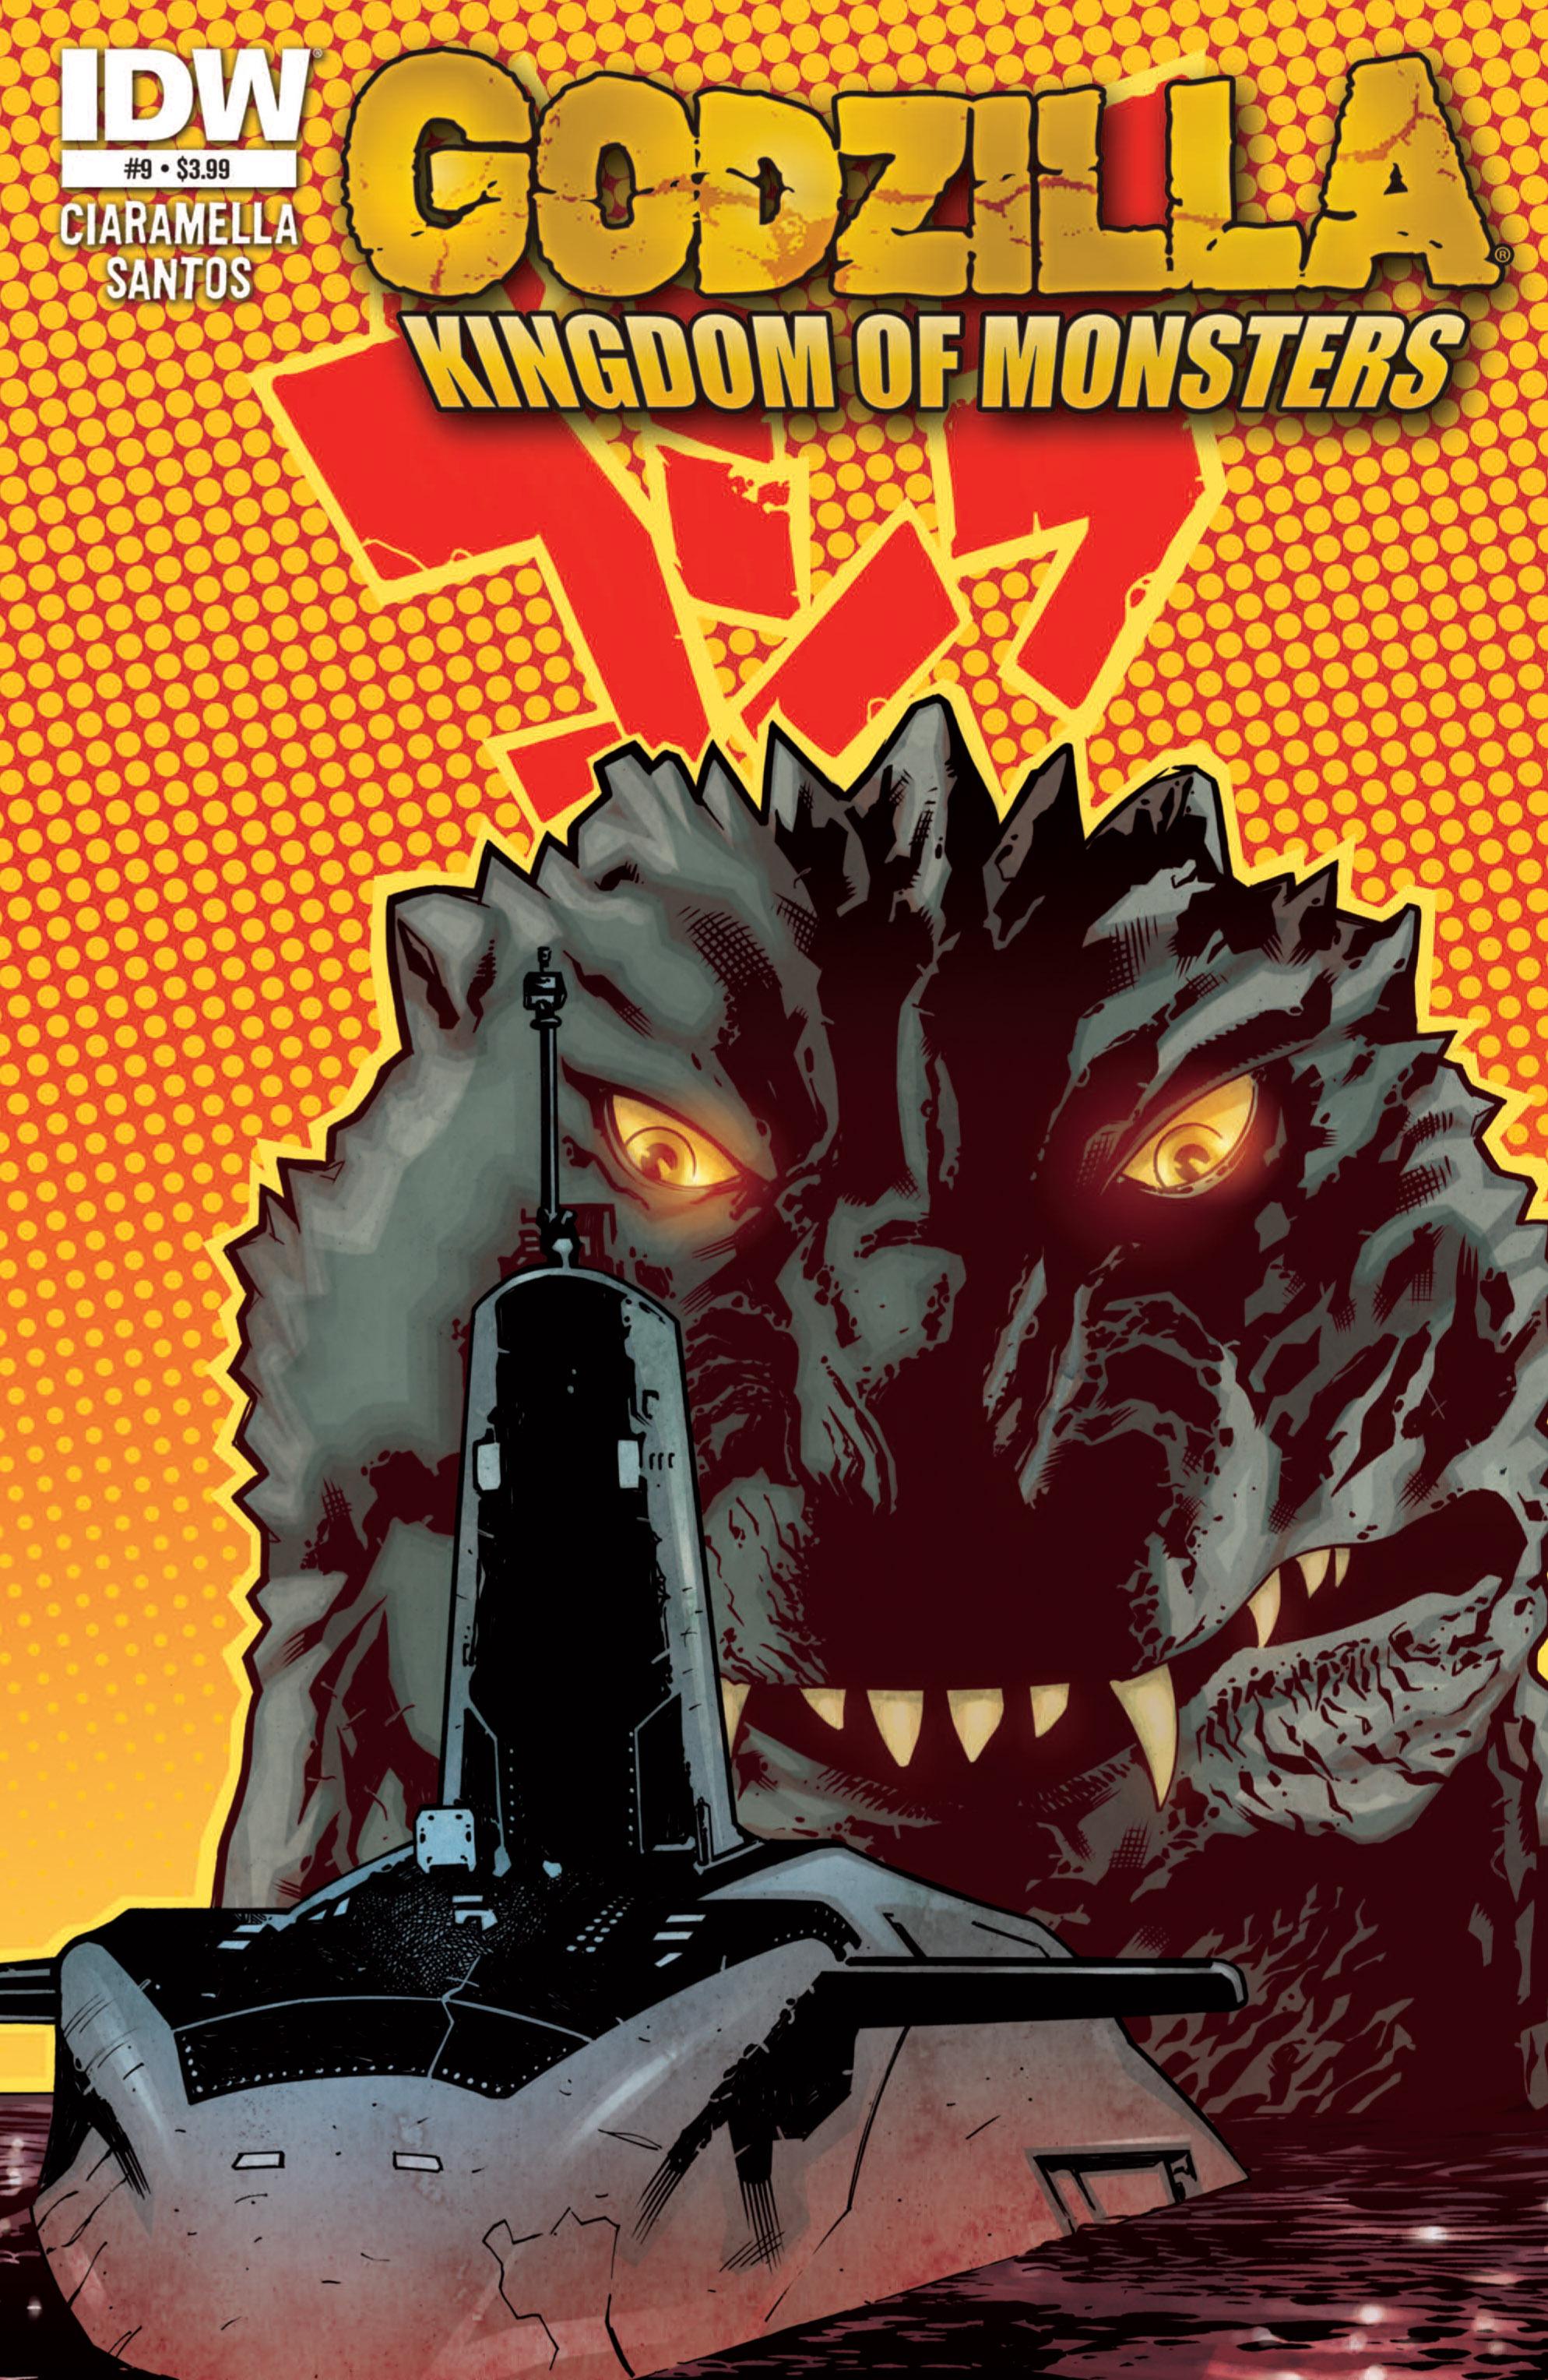 Godzilla: Kingdom of Monsters 9 Page 1